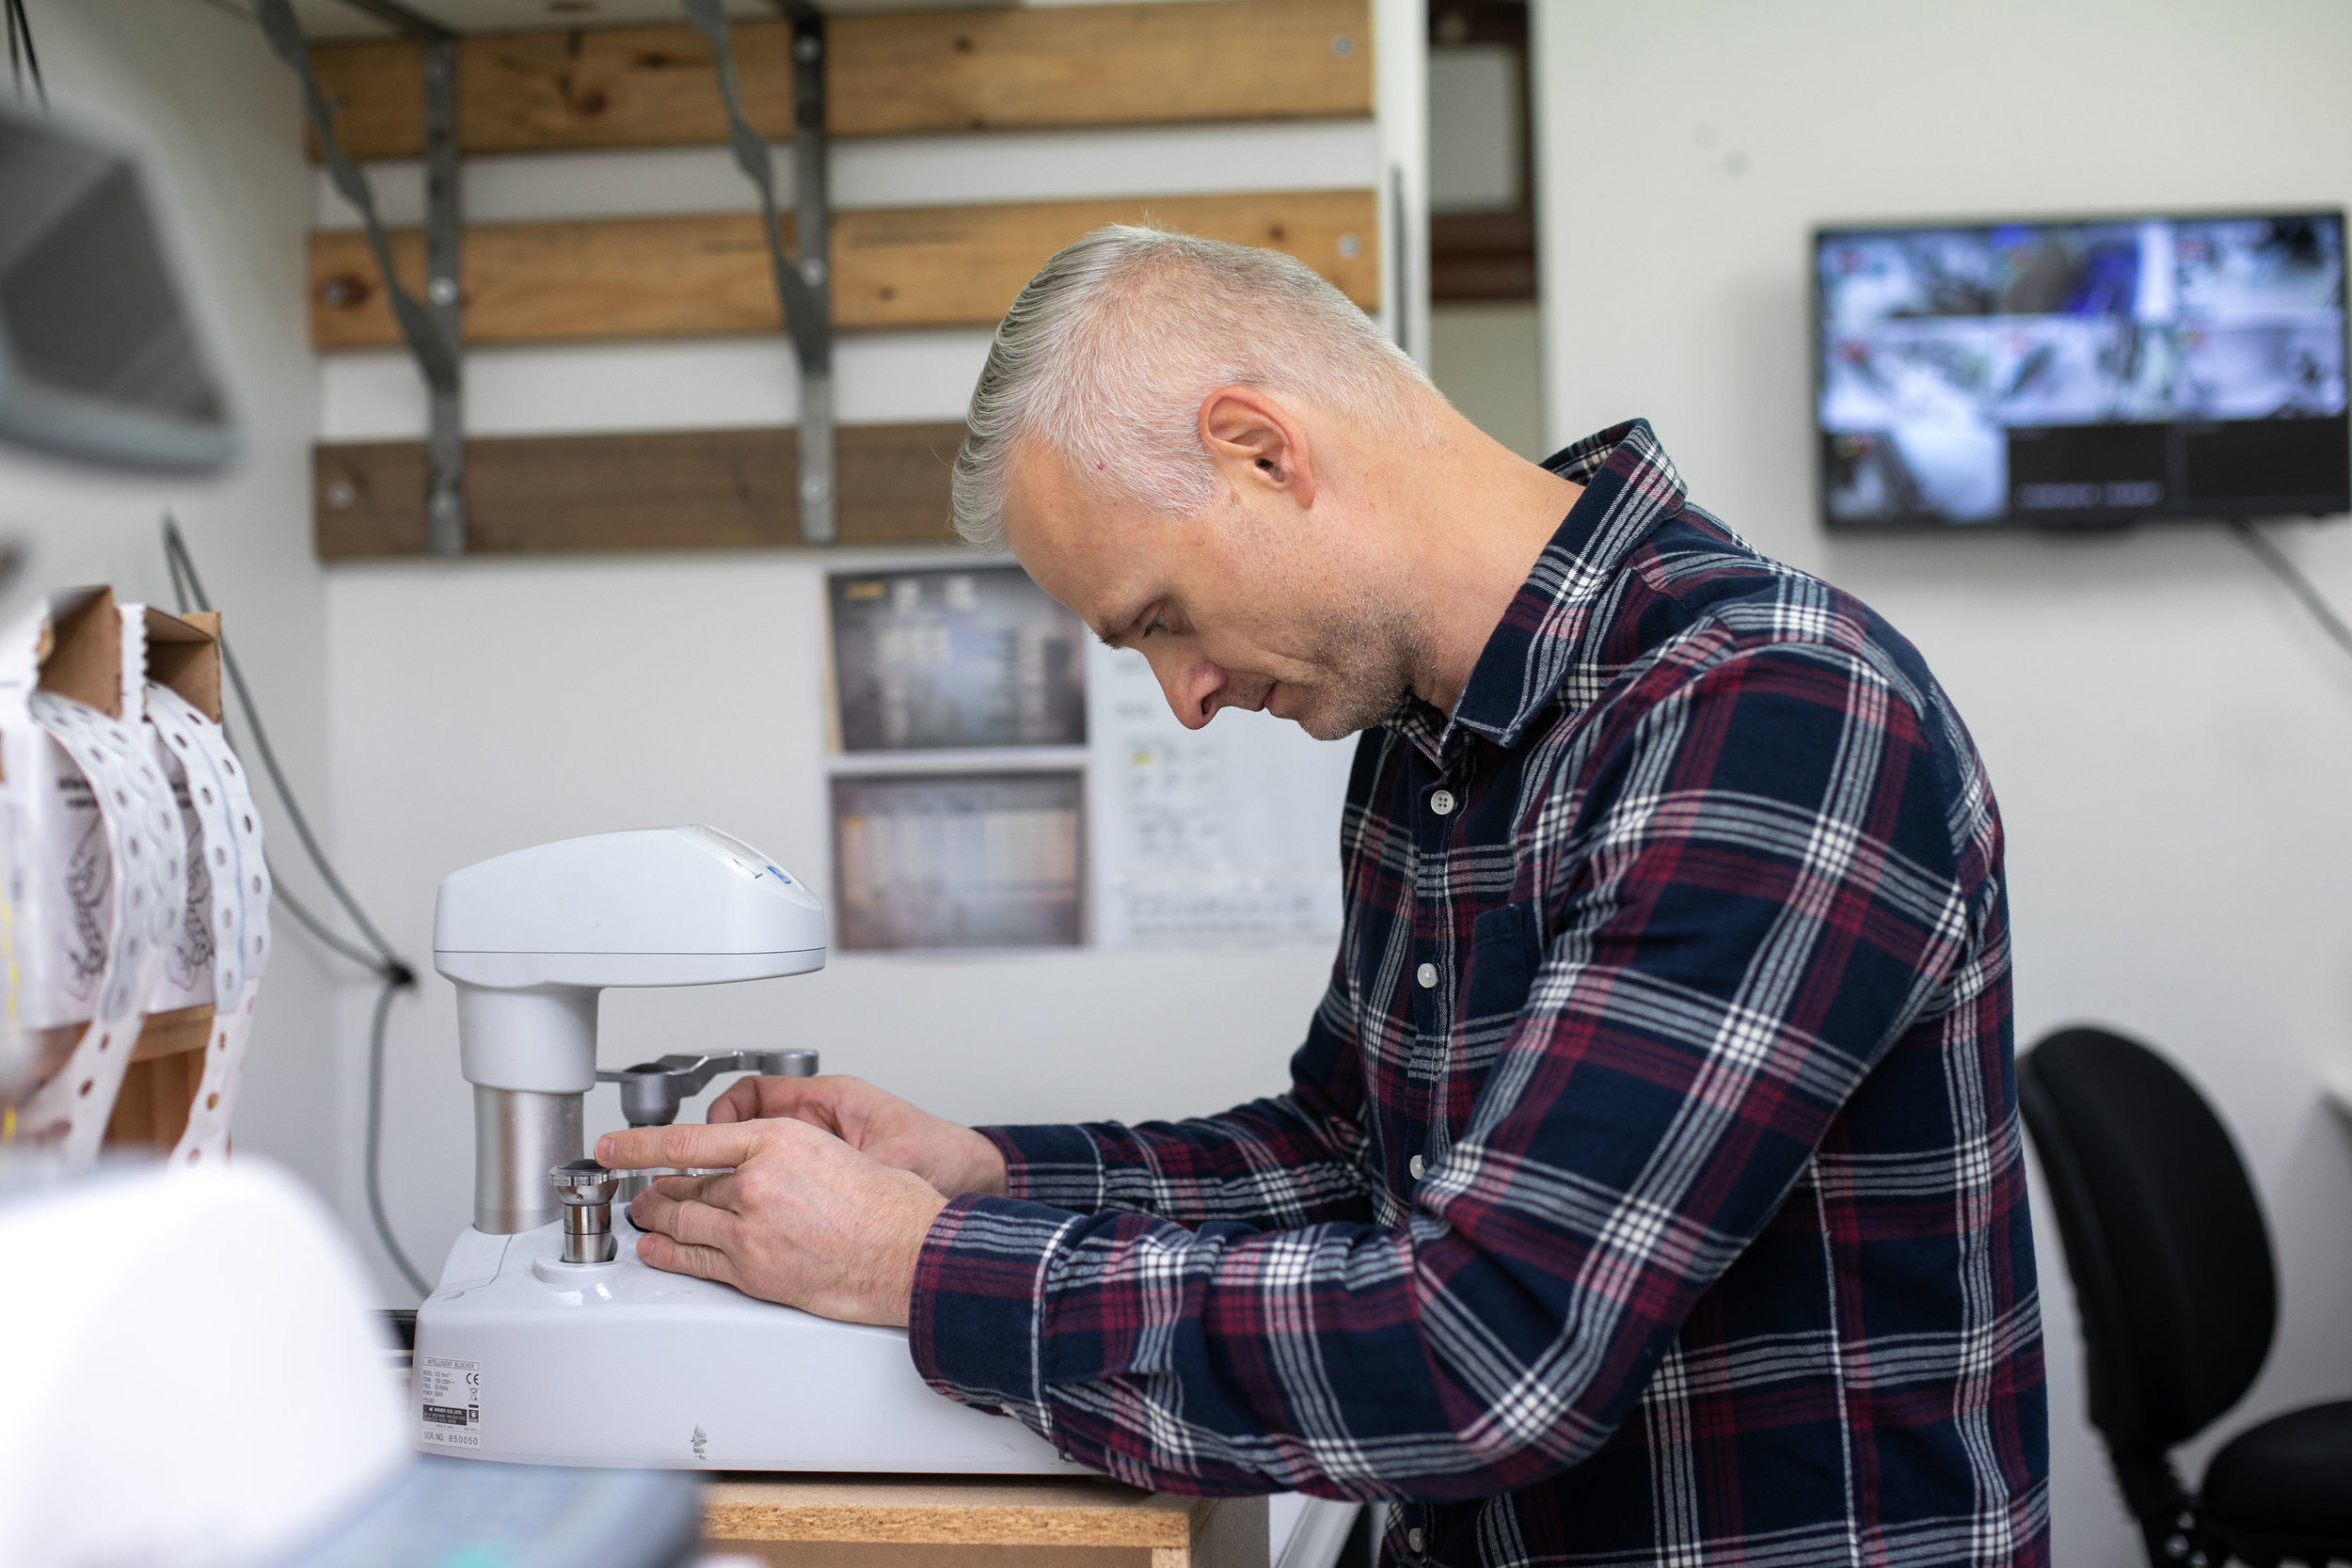 David Slama, part owner of  Reflekt  fits a customer's lenses into their chosen frame. Image: Melanie de Ruyter for Winterlicous 2019.